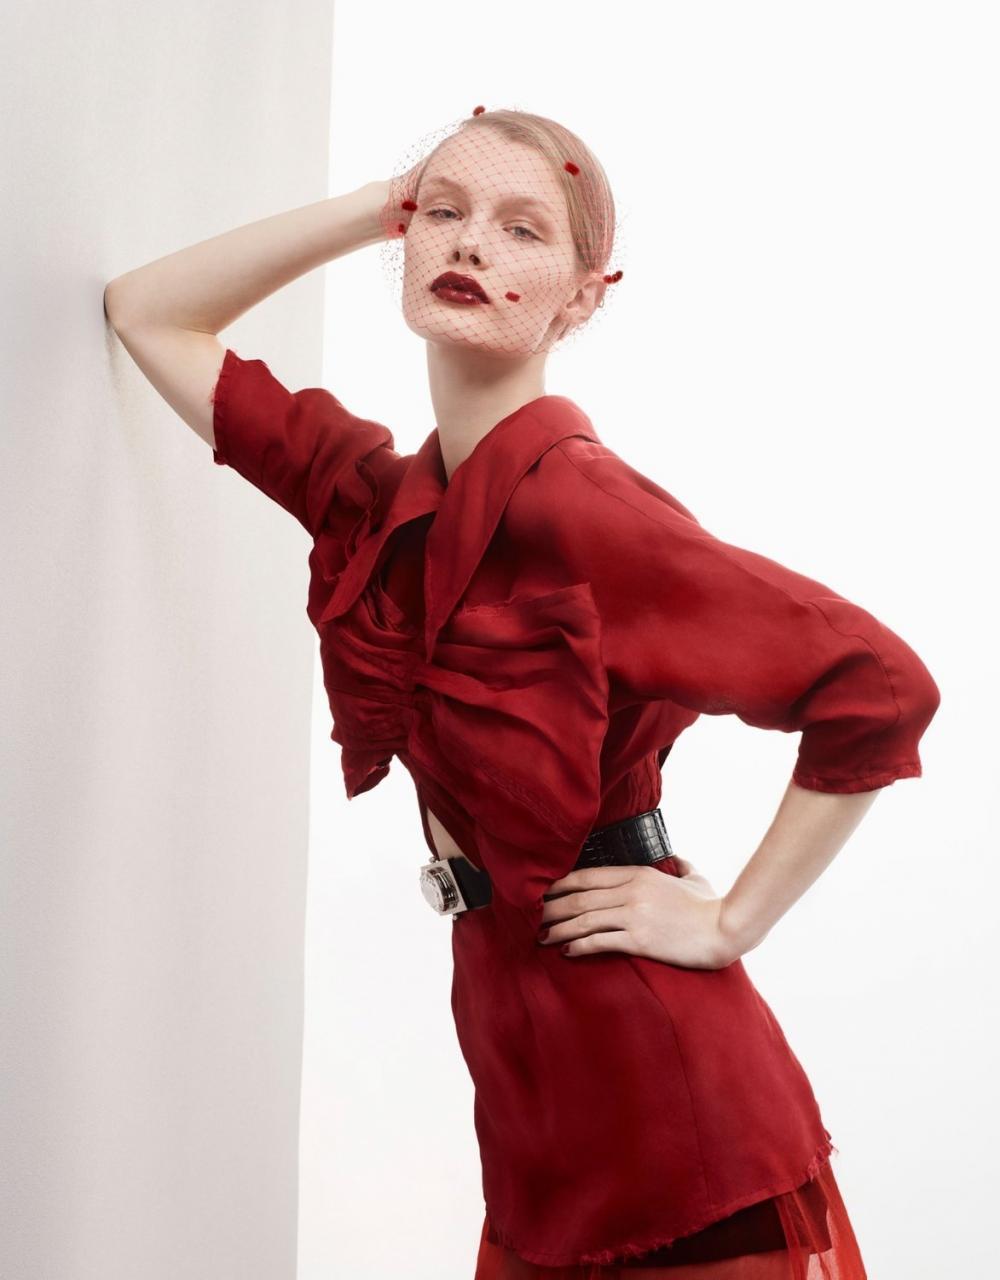 《VOGUE》中国版2019年1月刊 超模Kris Grikaite出镜 时尚图库 第3张